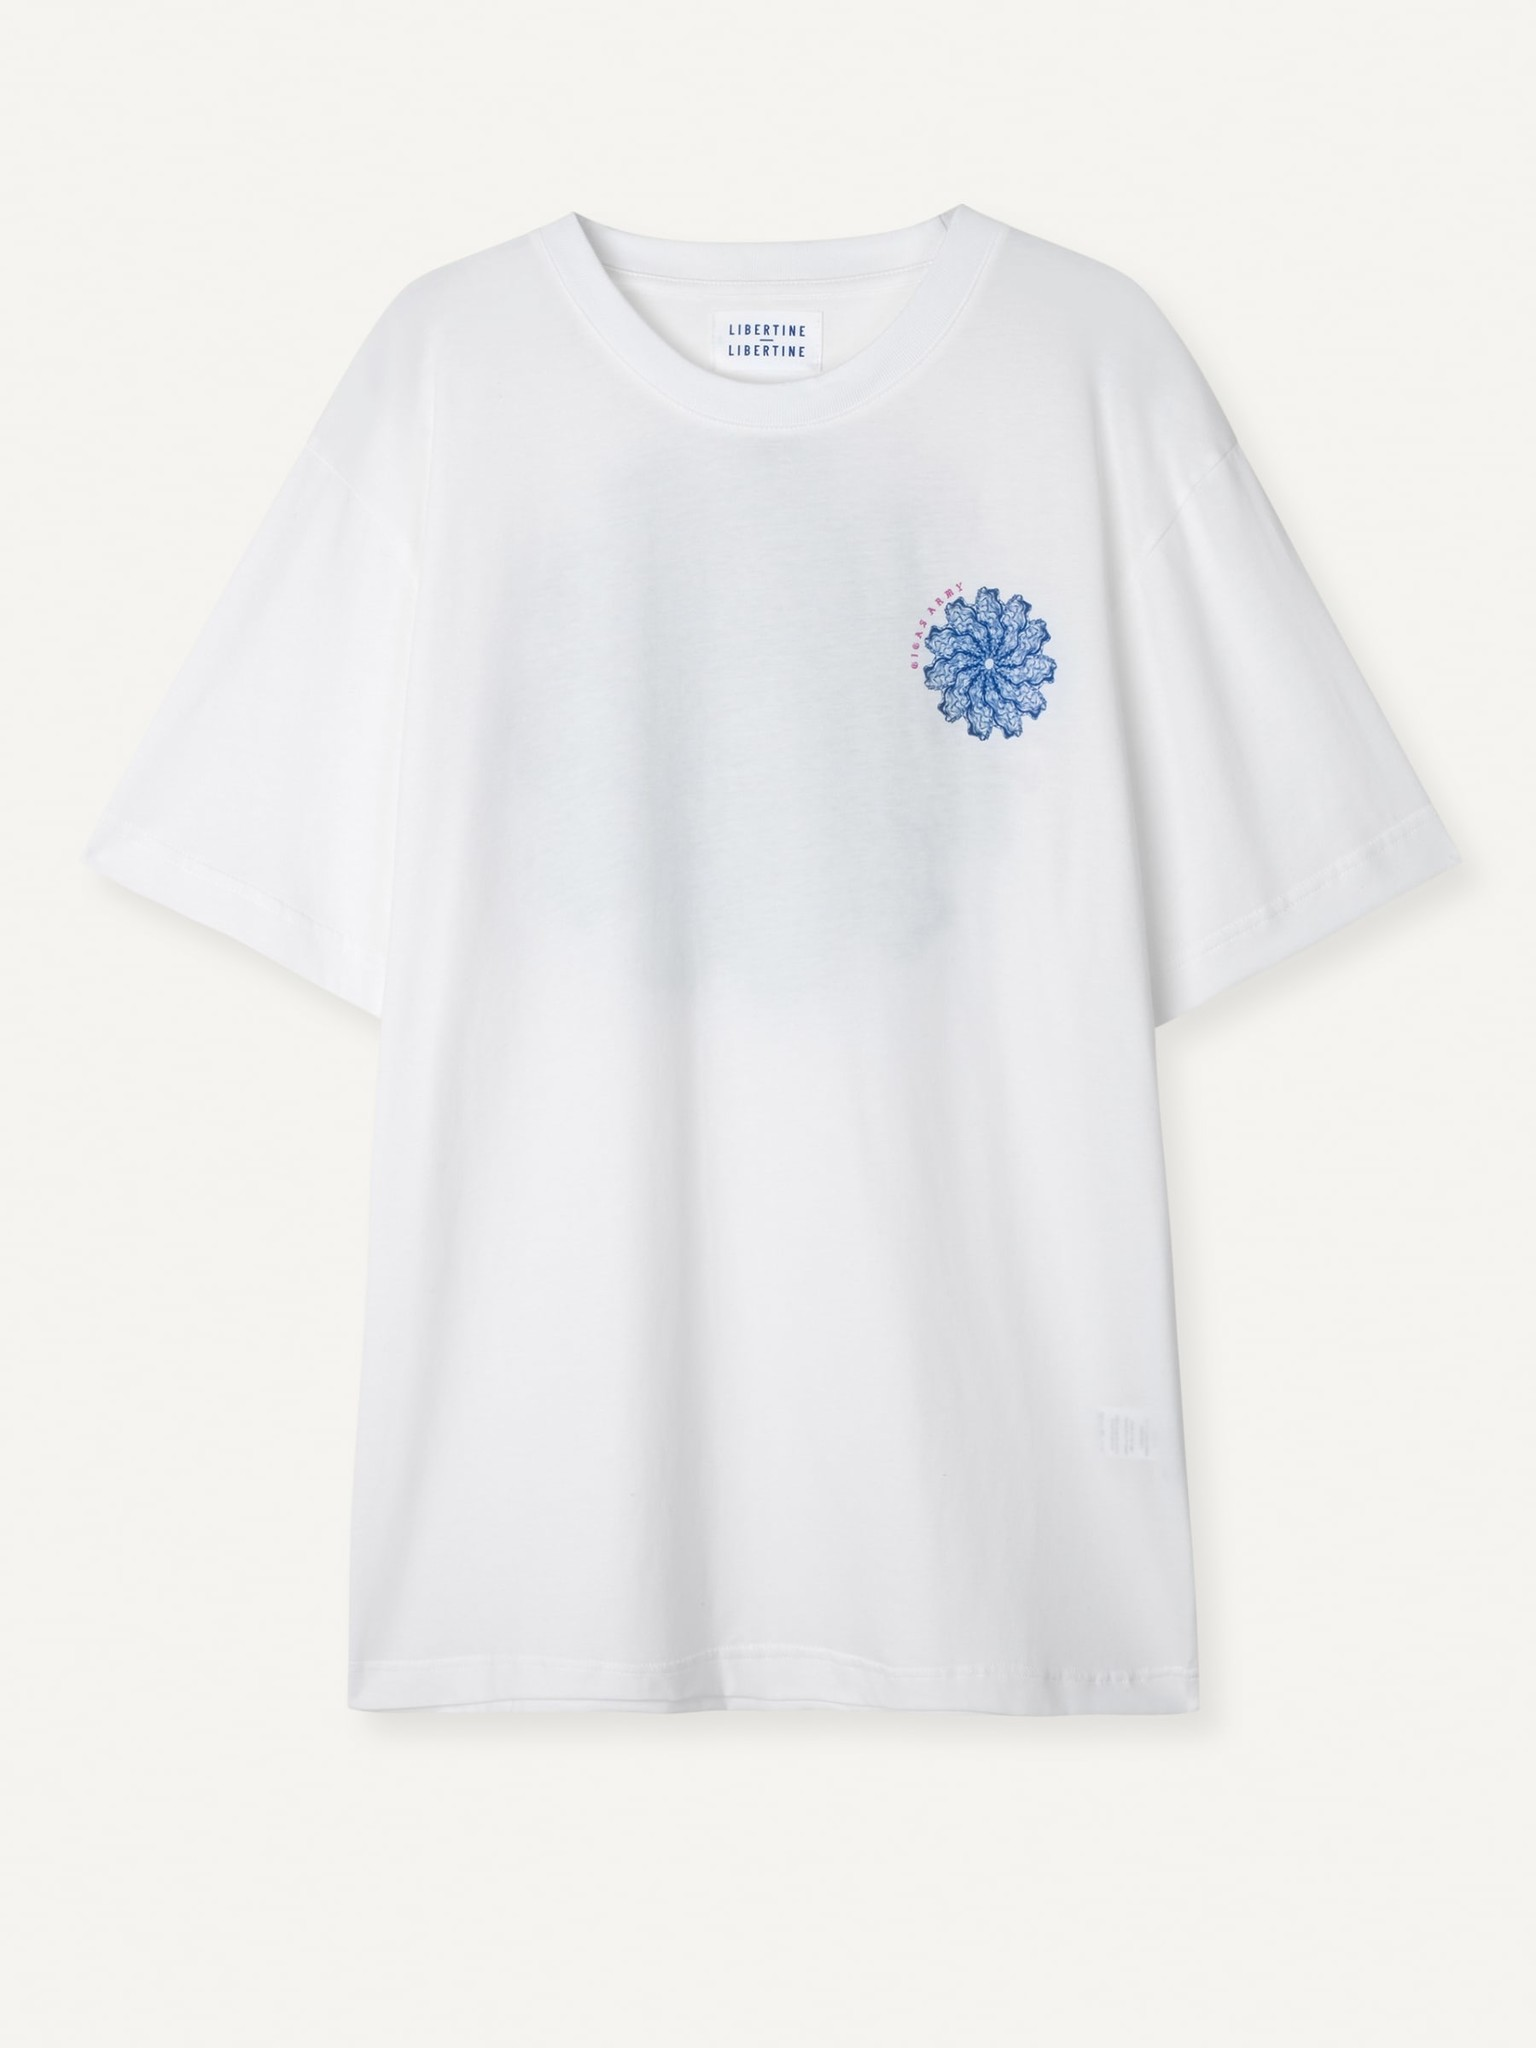 Beat Gigas Army T-Shirt White-3